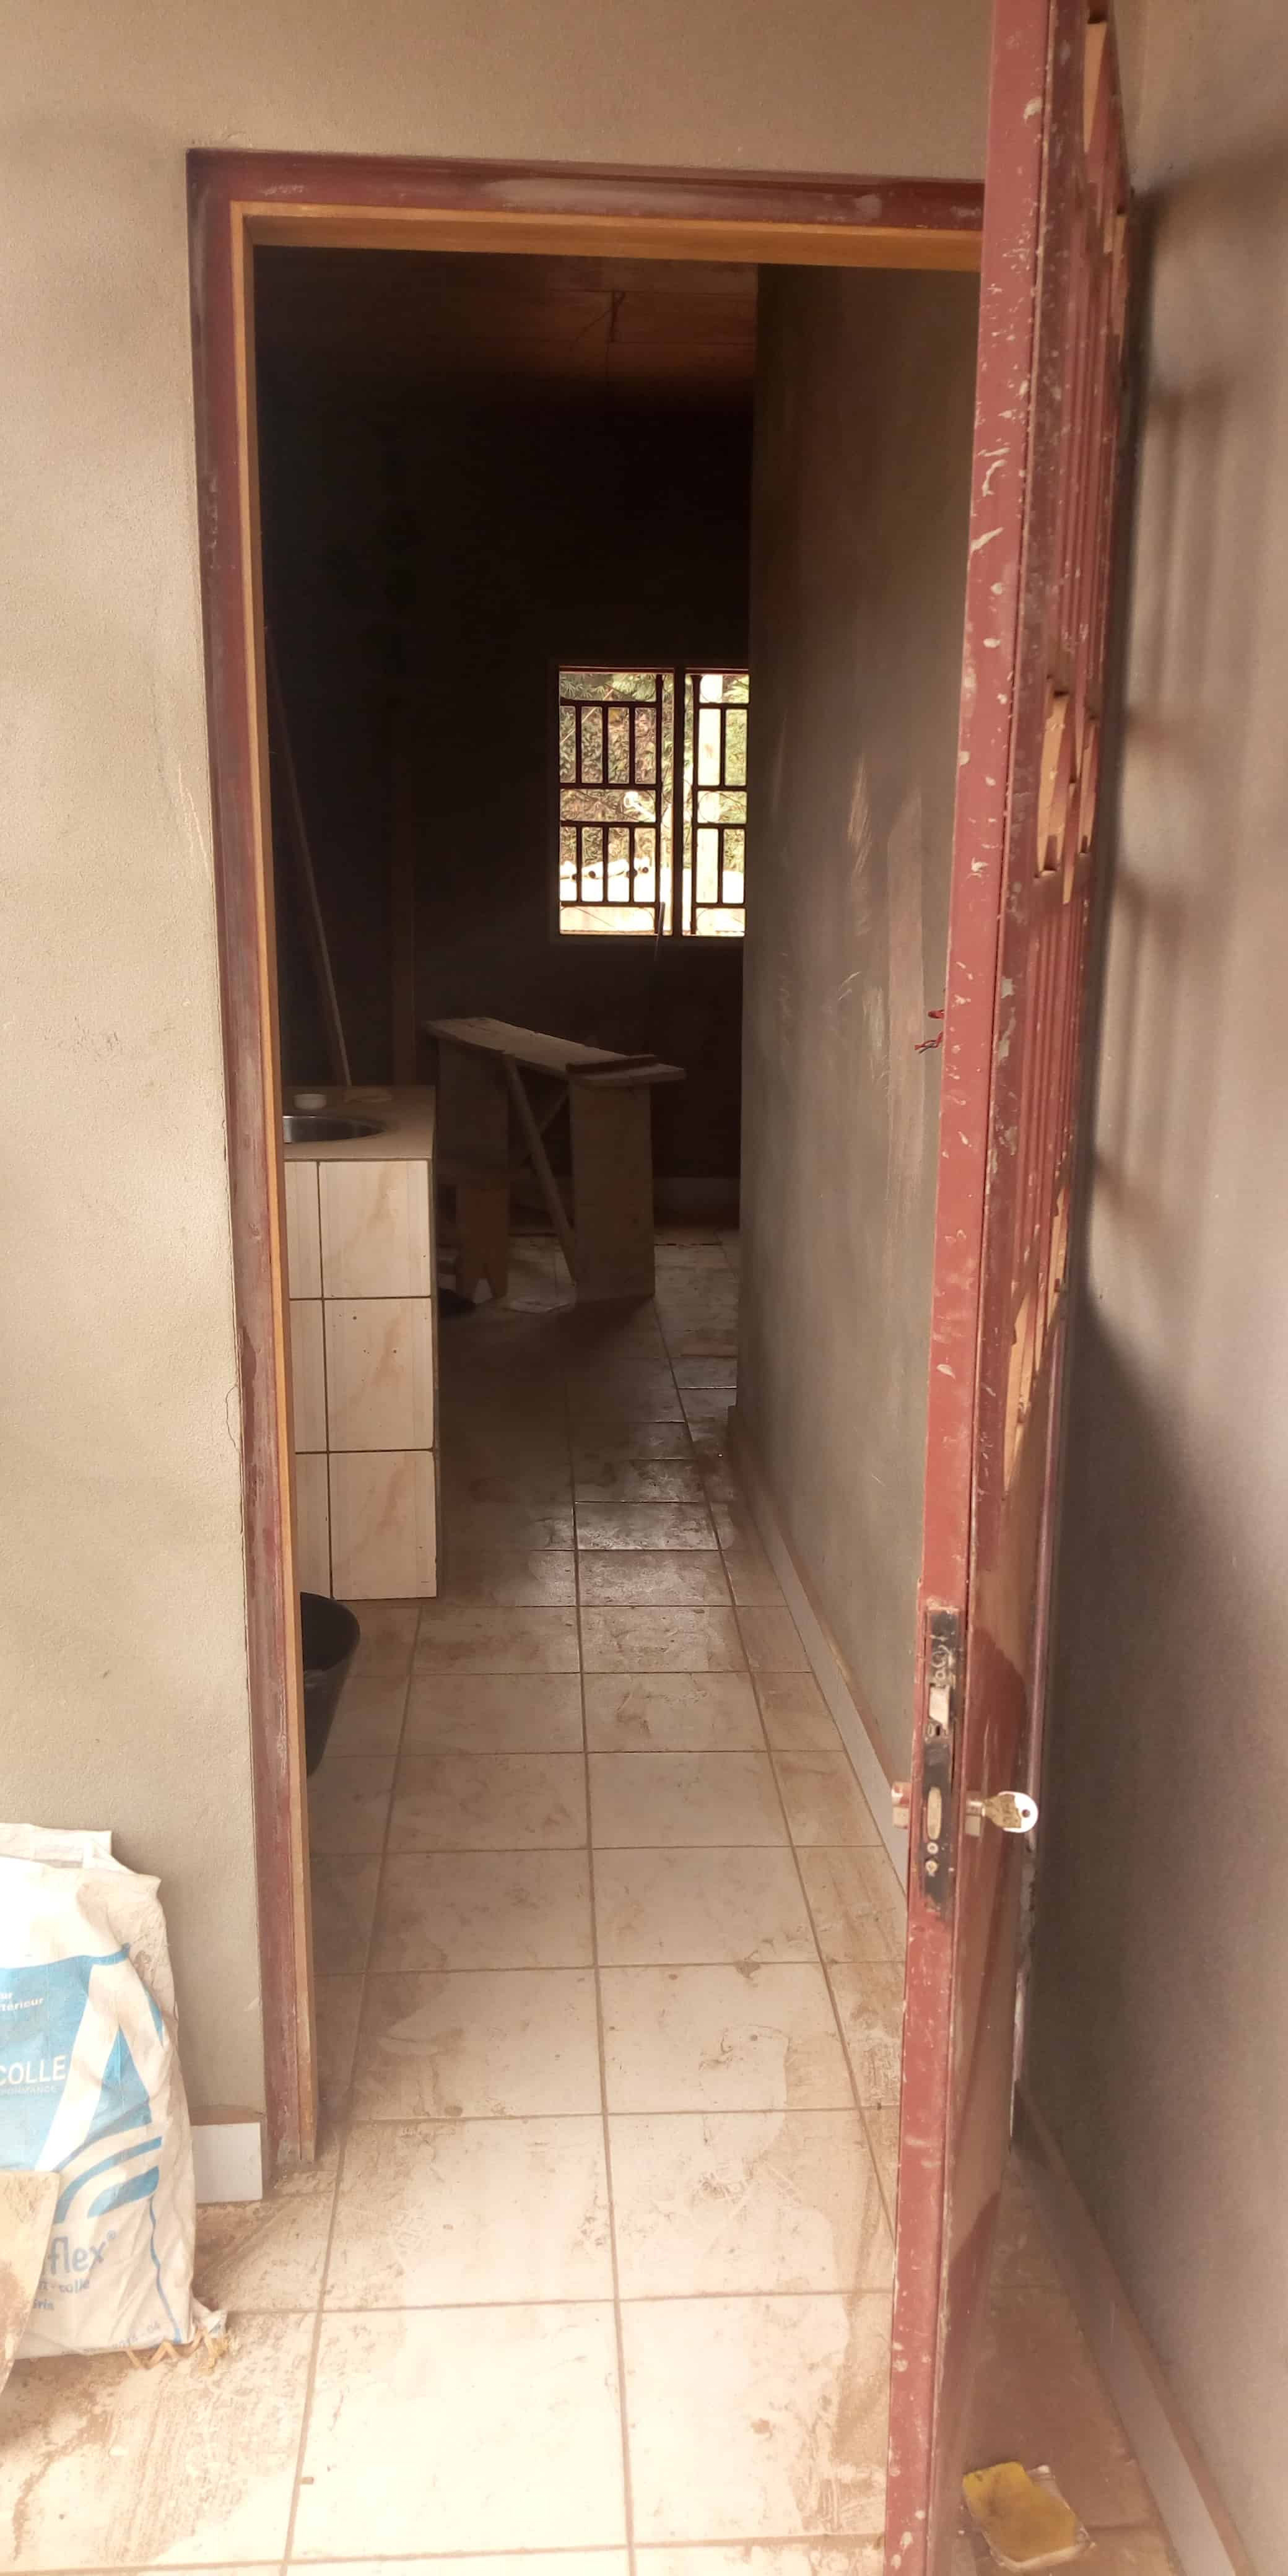 Studio to rent - Yaoundé, Abome, Chambre moderne à louer Yaoundé nouvelle route nsimeyong - 40 000 FCFA / month